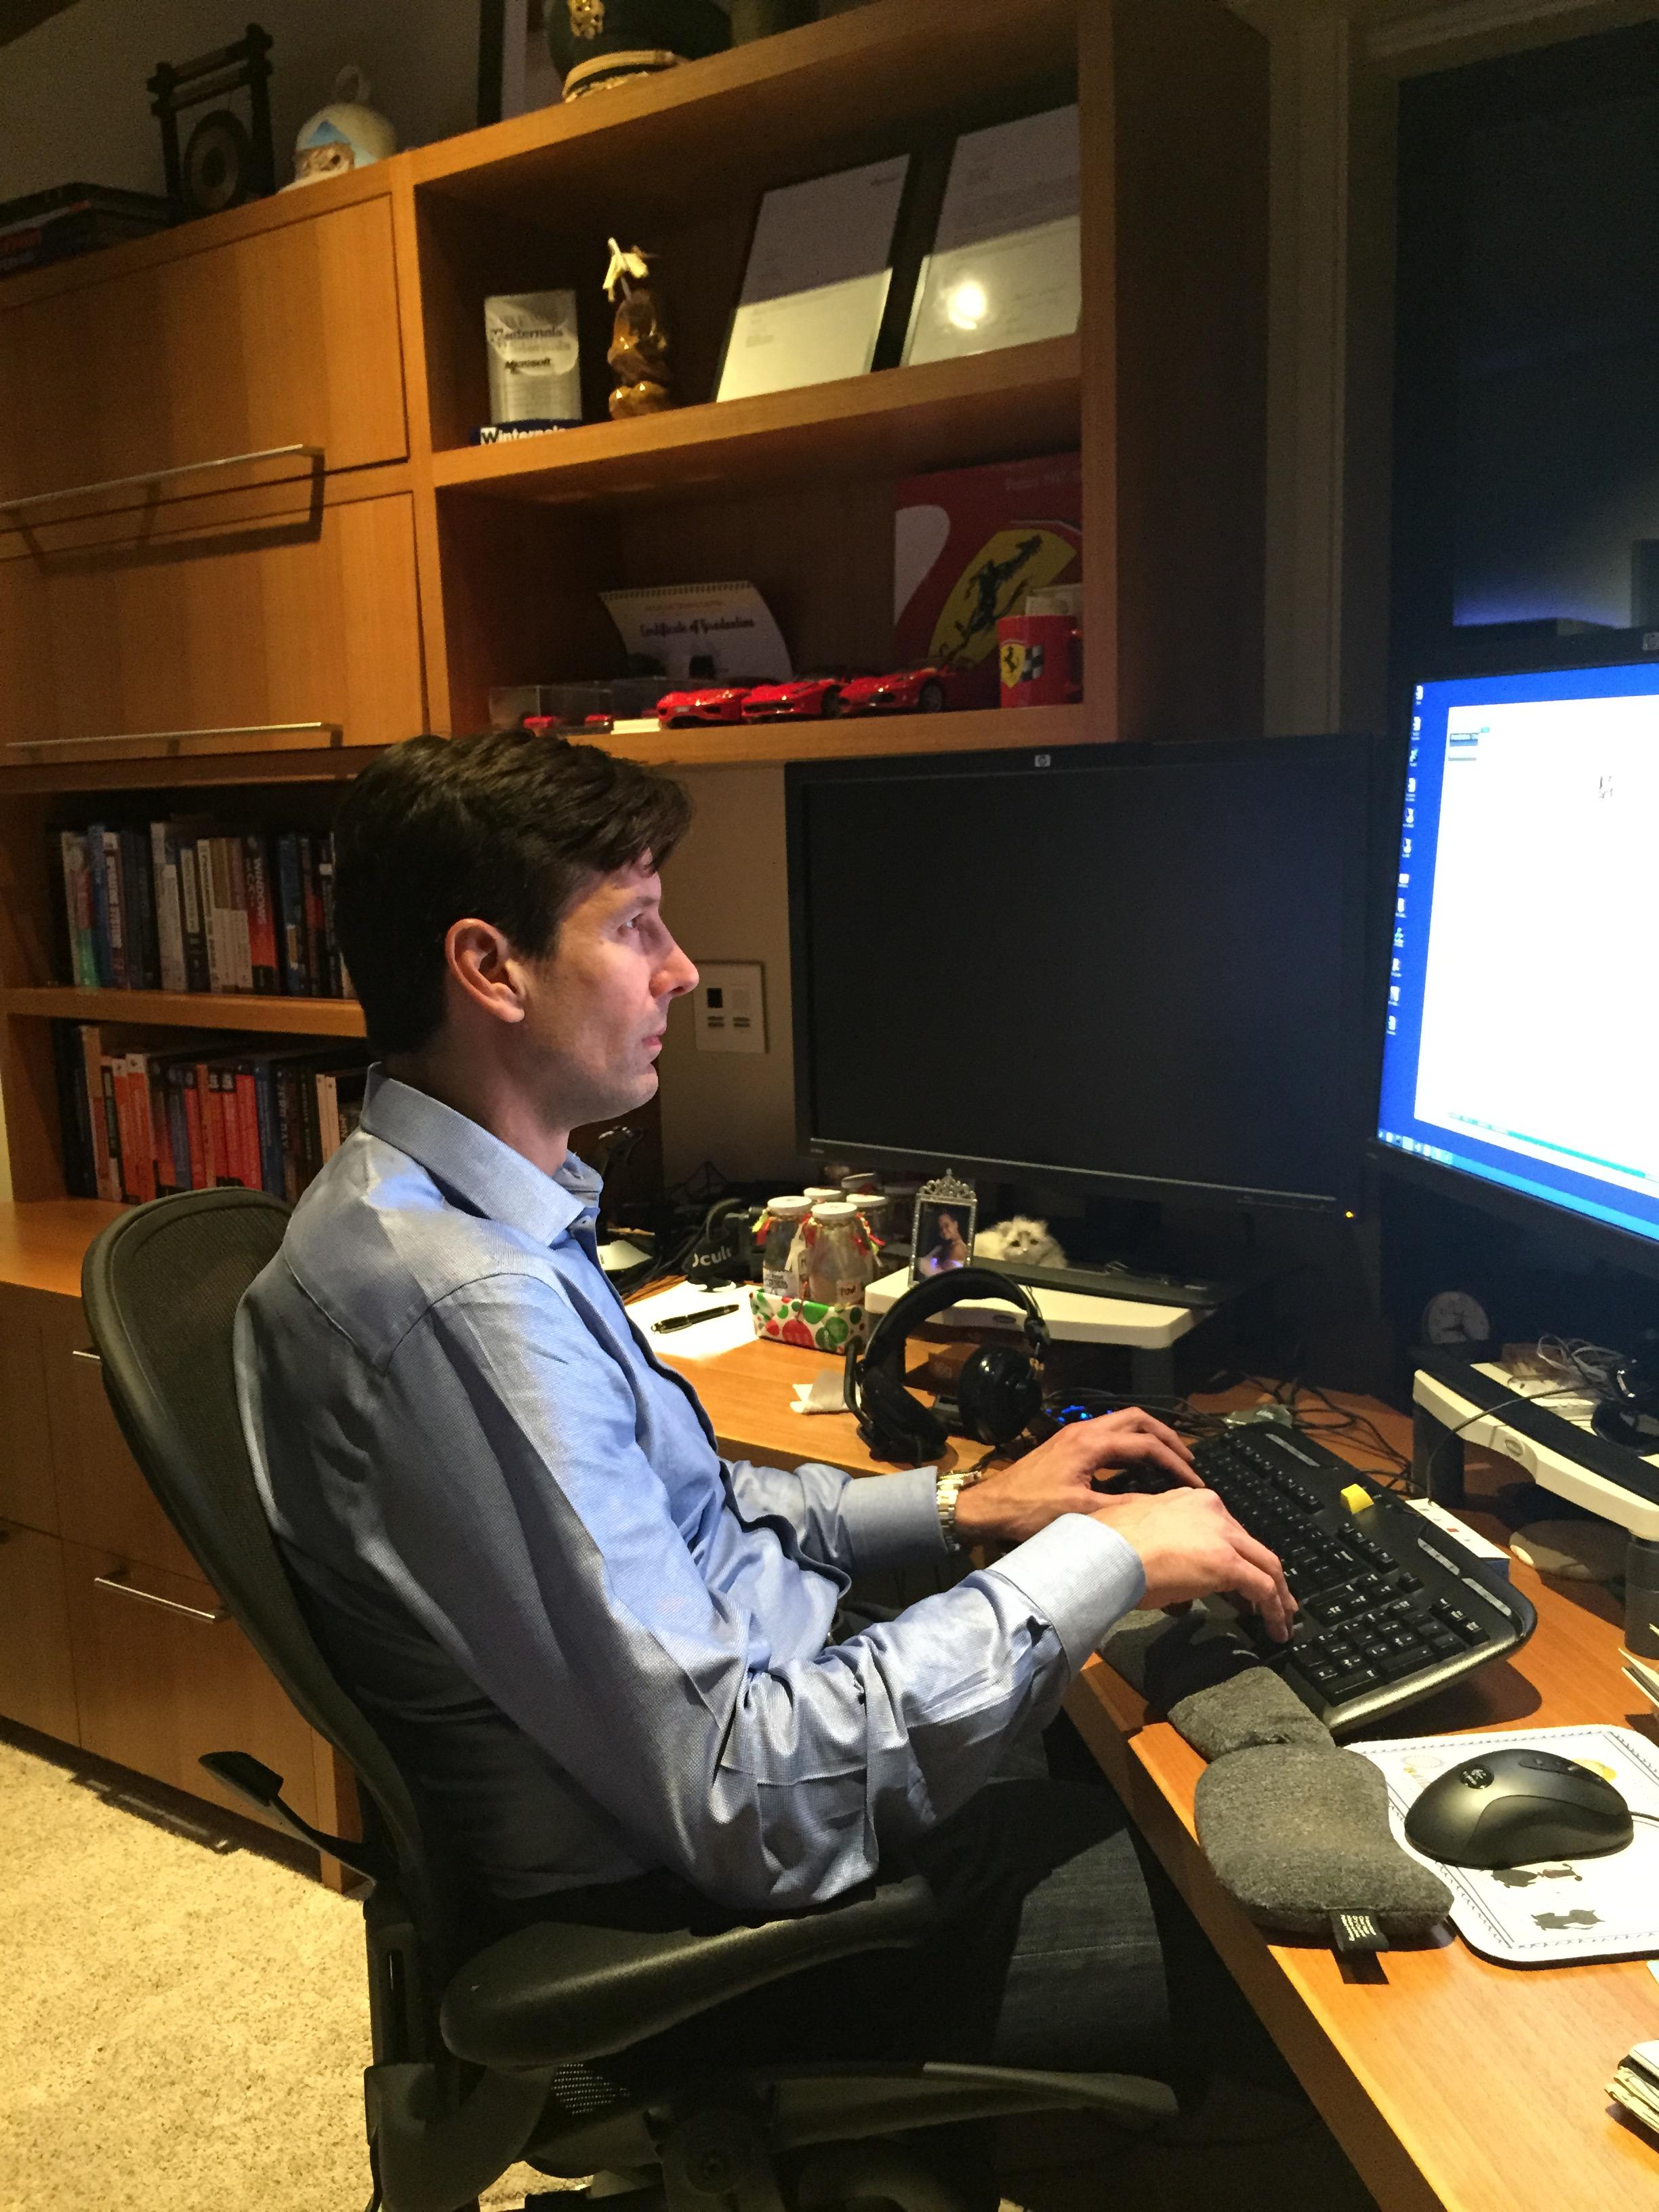 Microsoft CTO Mark Russinovich at his home office.